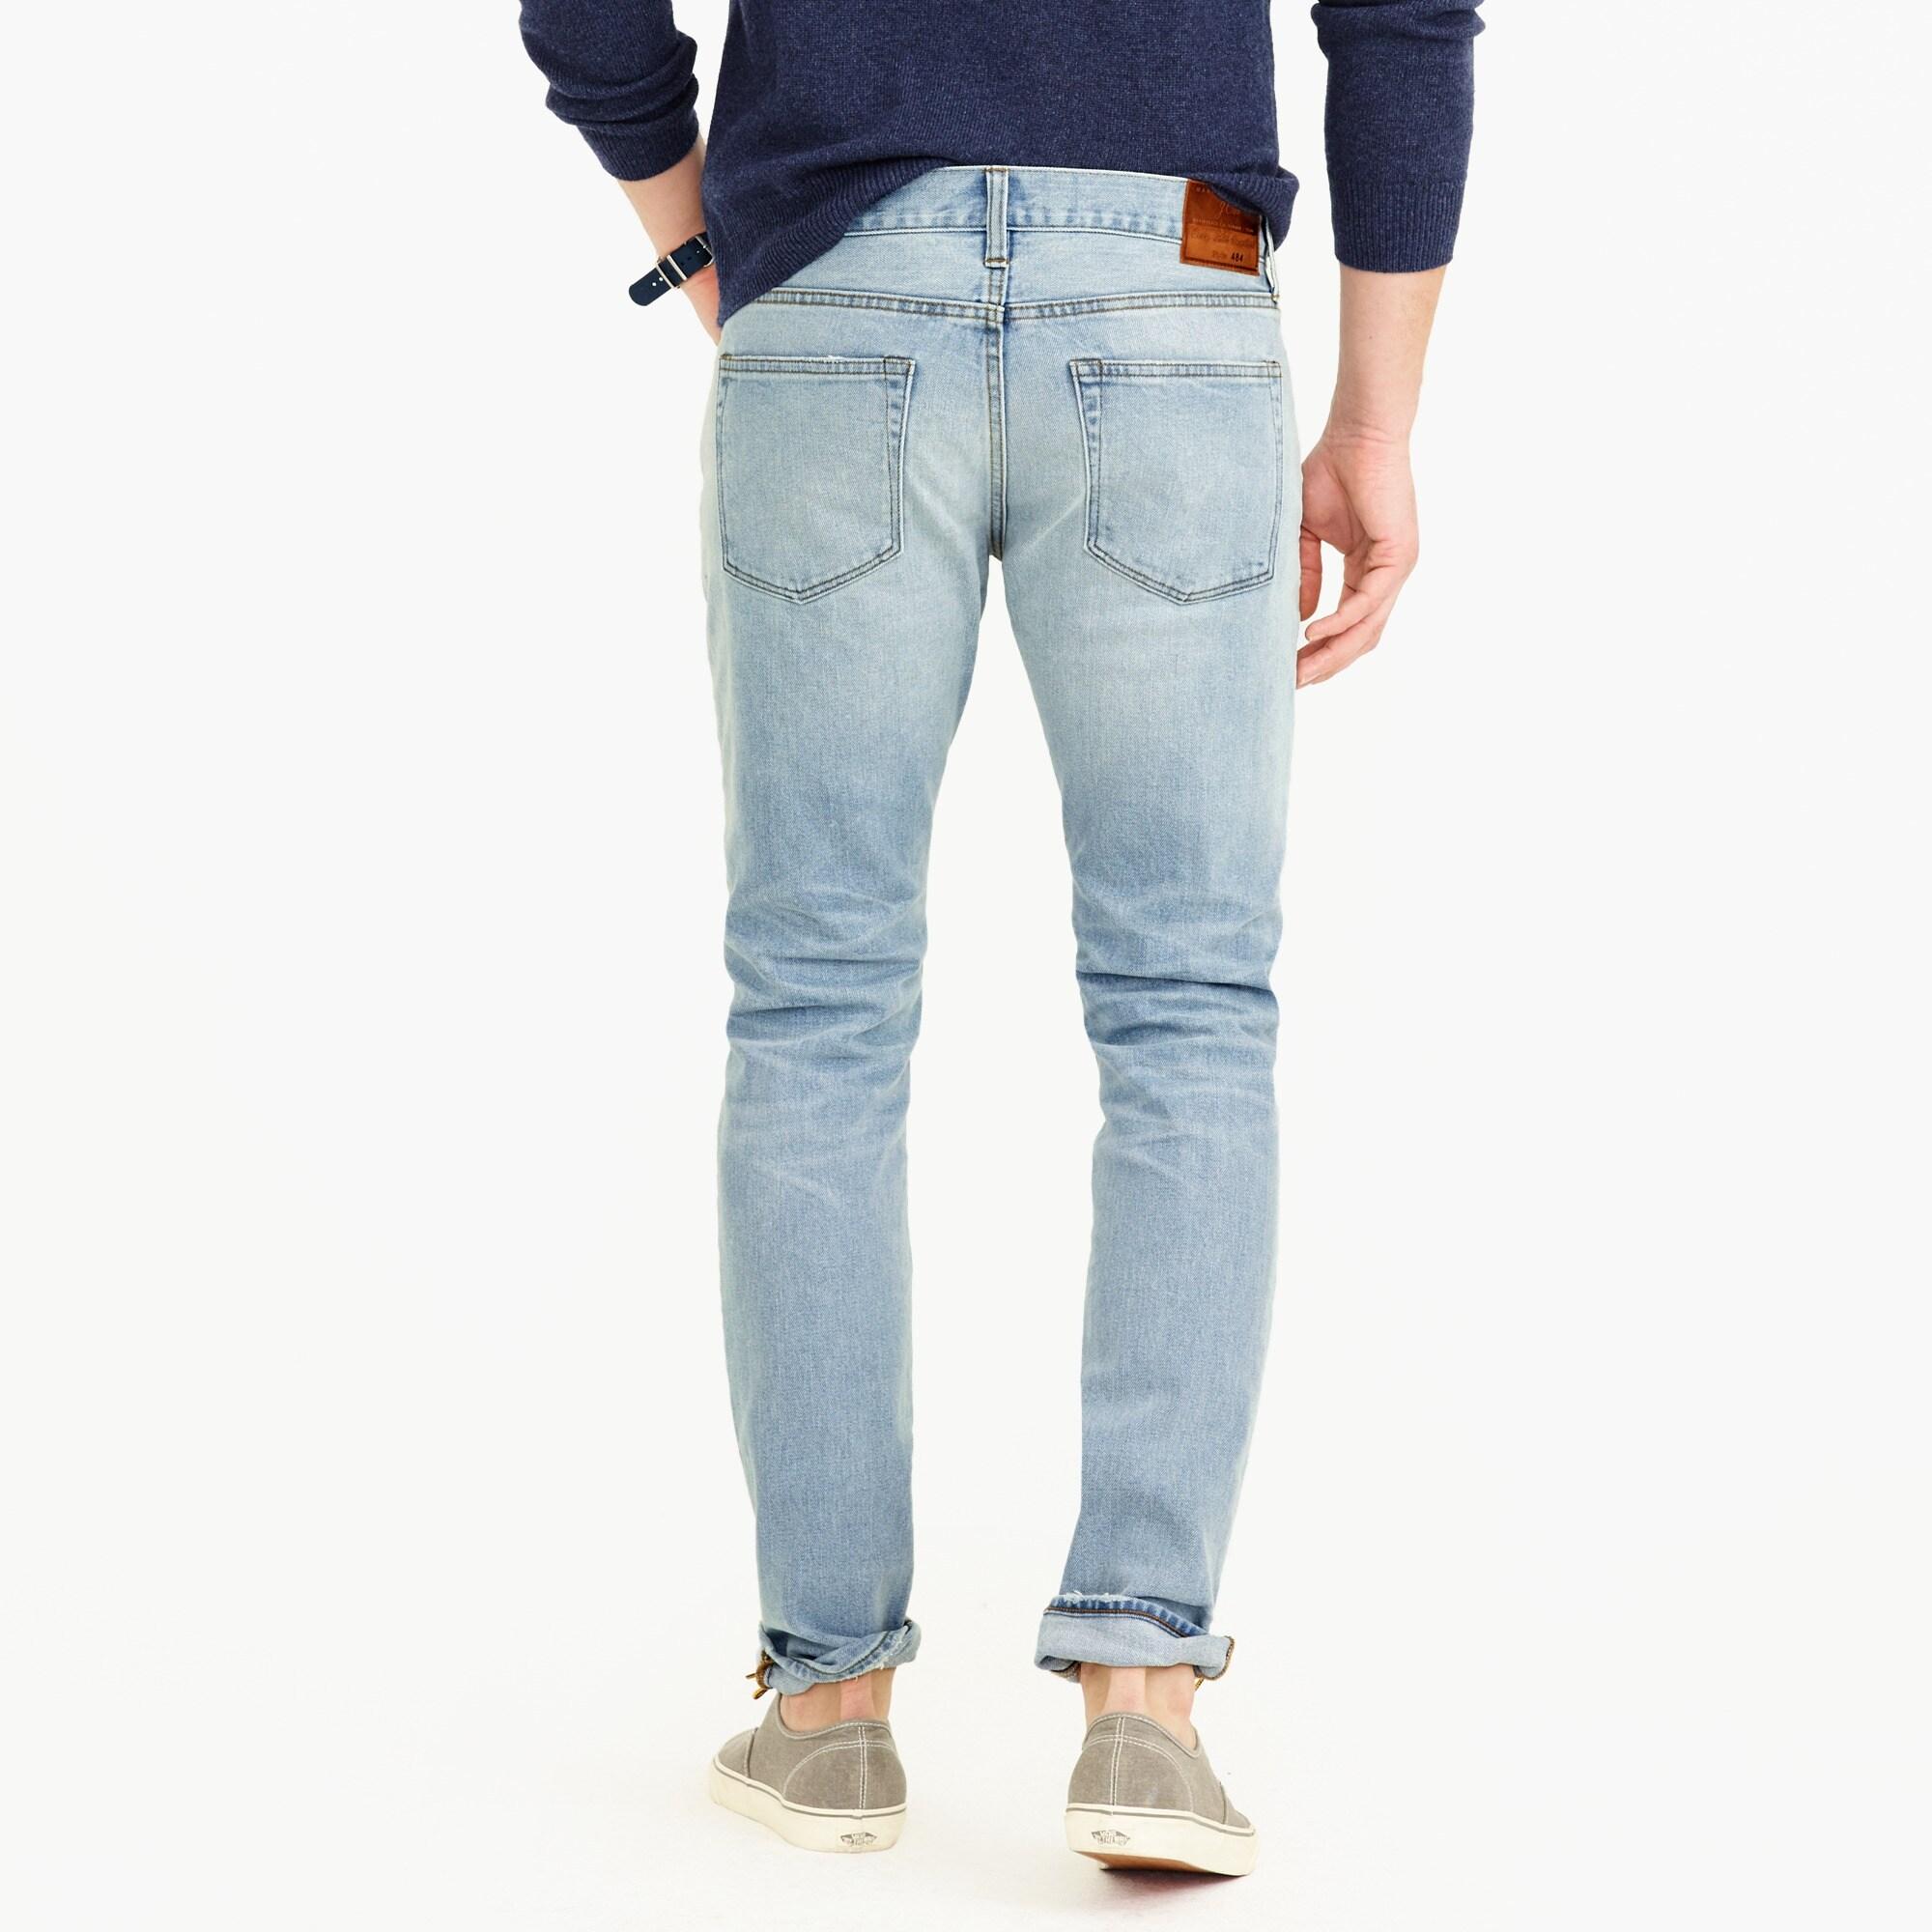 484 slim stretch jean in Marshall wash